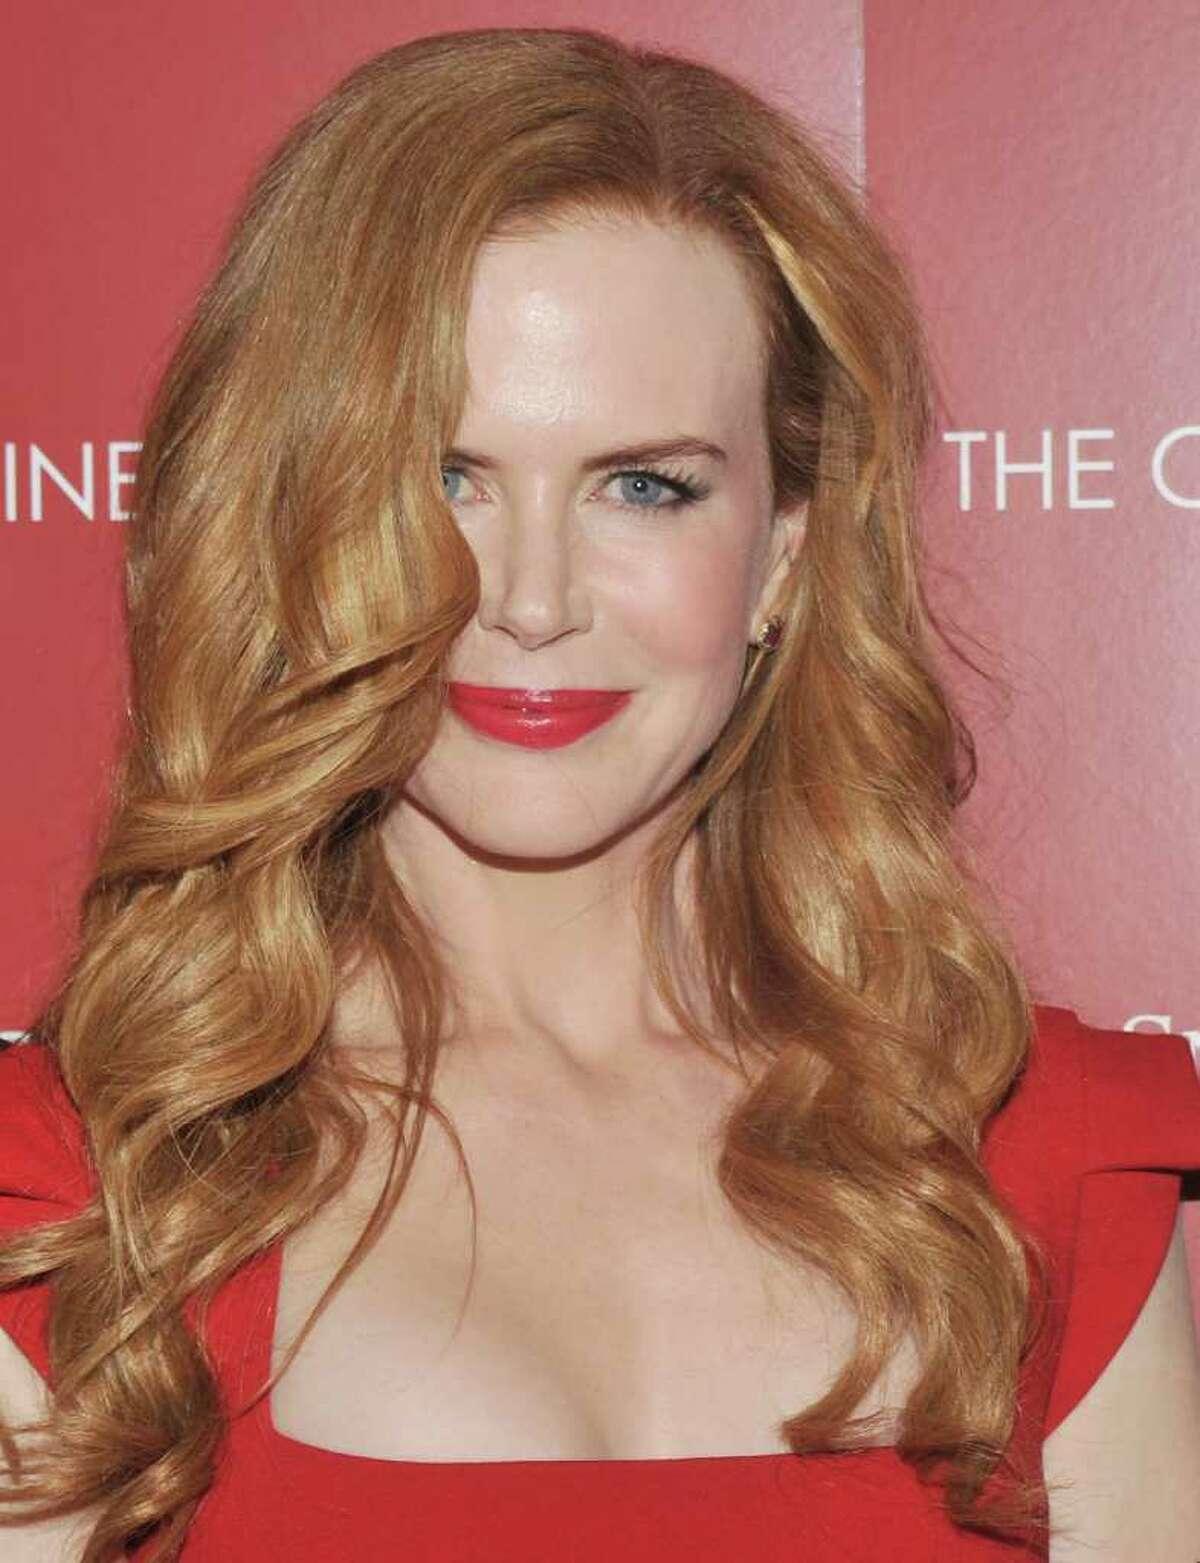 NEW YORK, NY - JULY 13: Actress Nicole Kidman attends the Cinema Society with Ivanka Trump Jewelry & Diane Von Furstenberg screening of